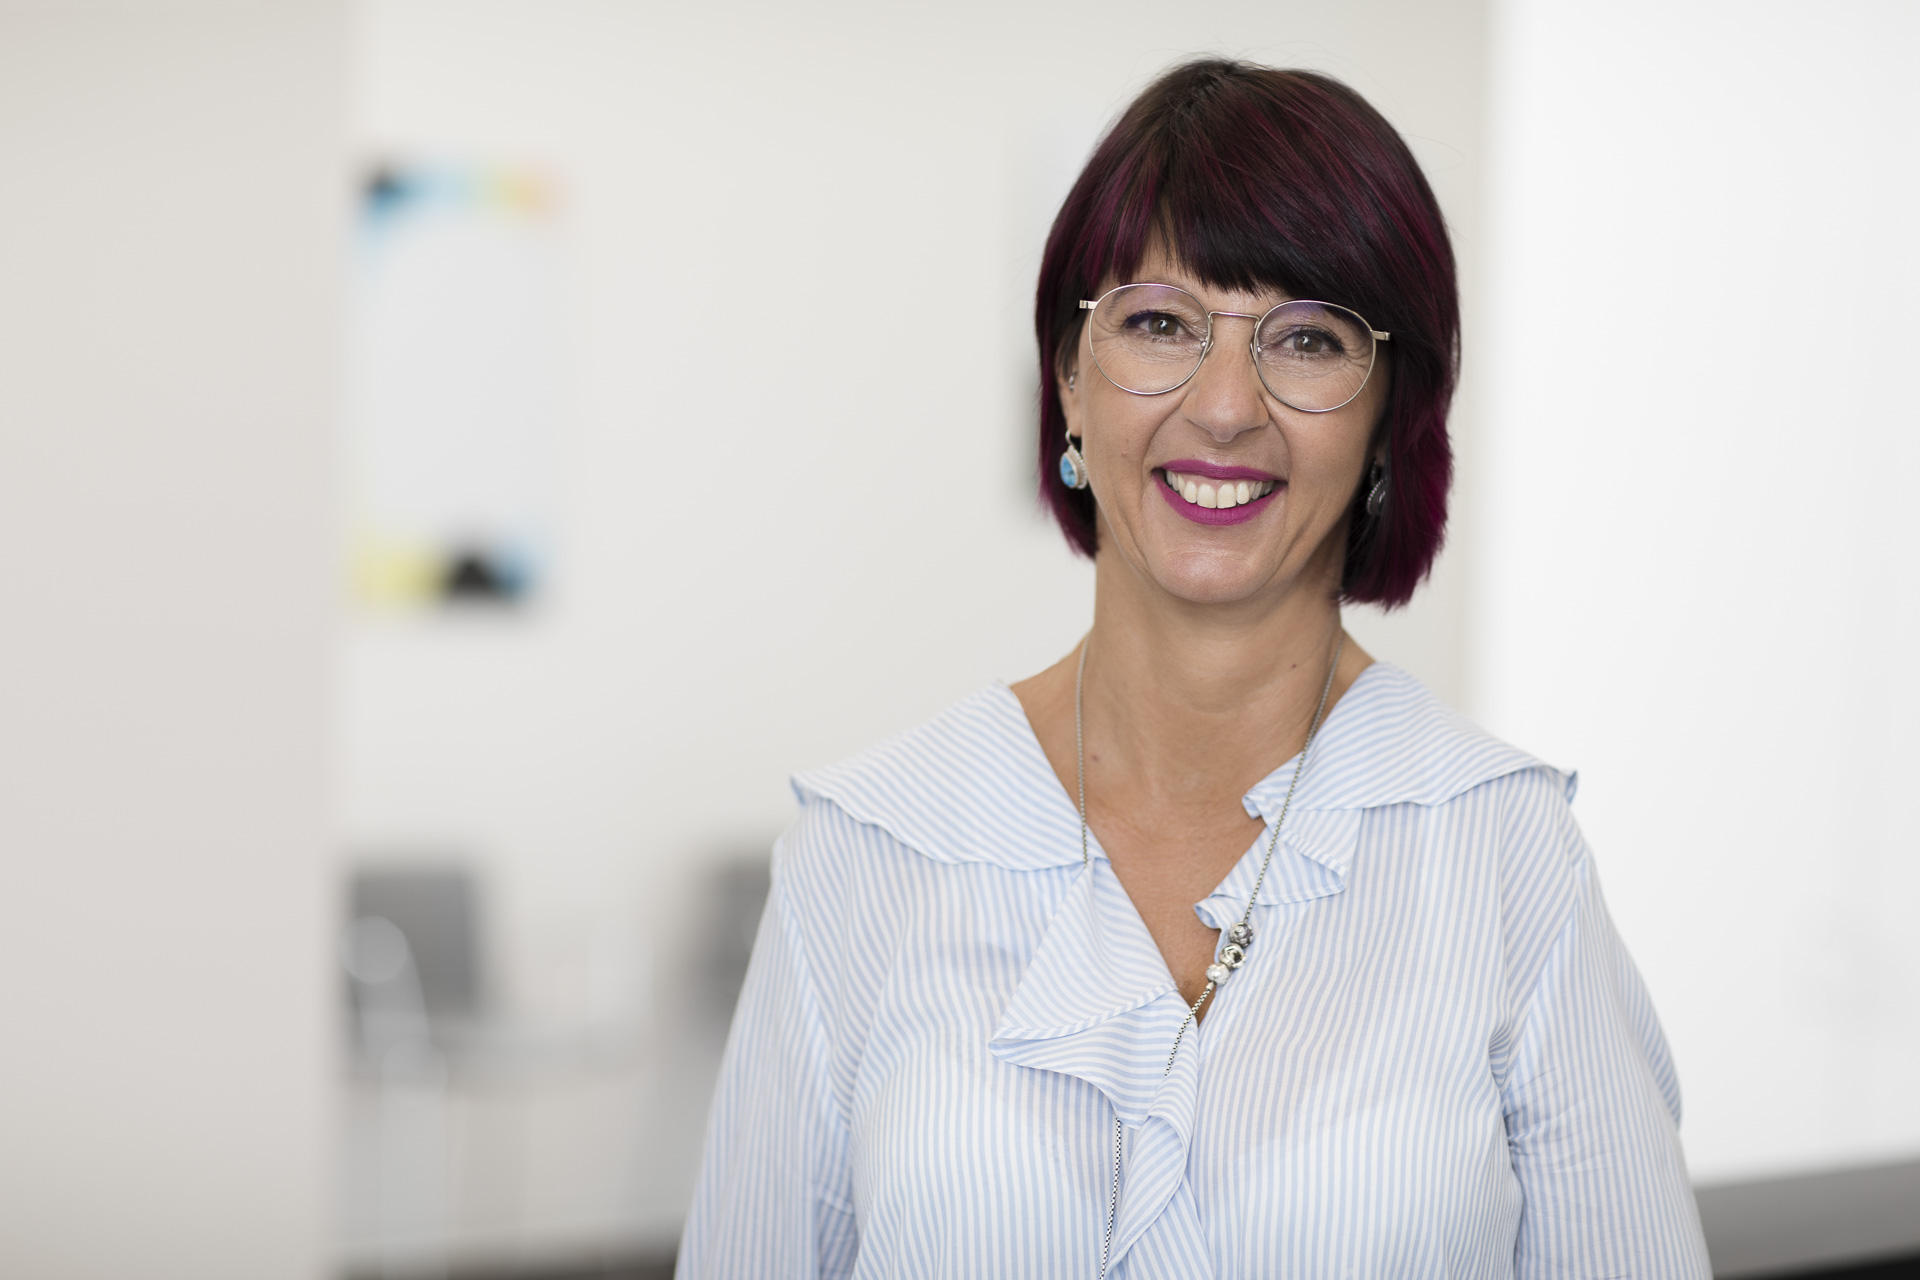 Jacqueline Emmenegger MPA